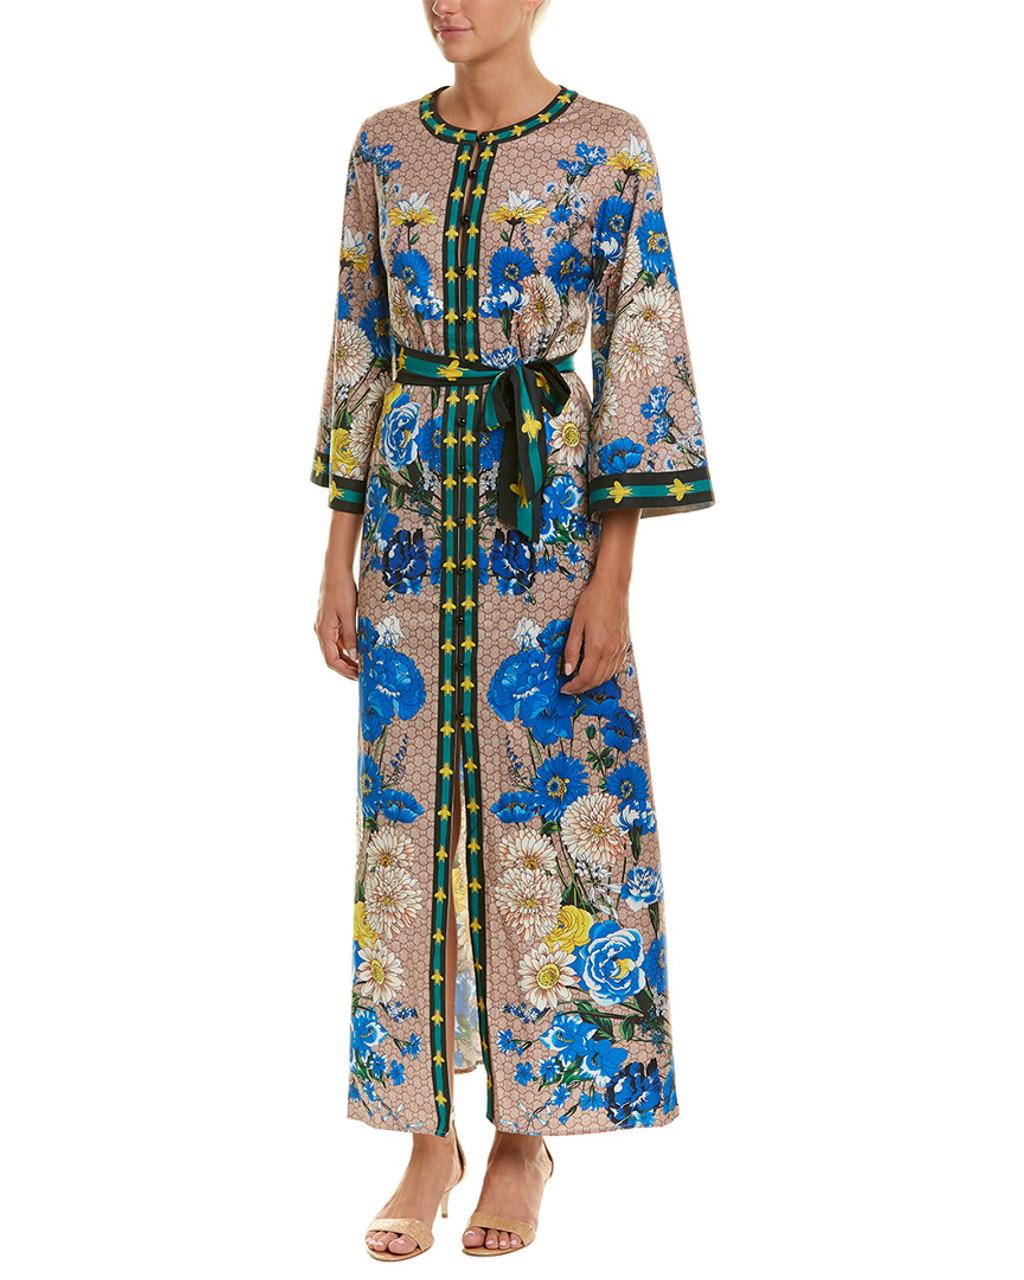 931f046ef6c801 Nisha Lace Short Sleeve Dress Yellow